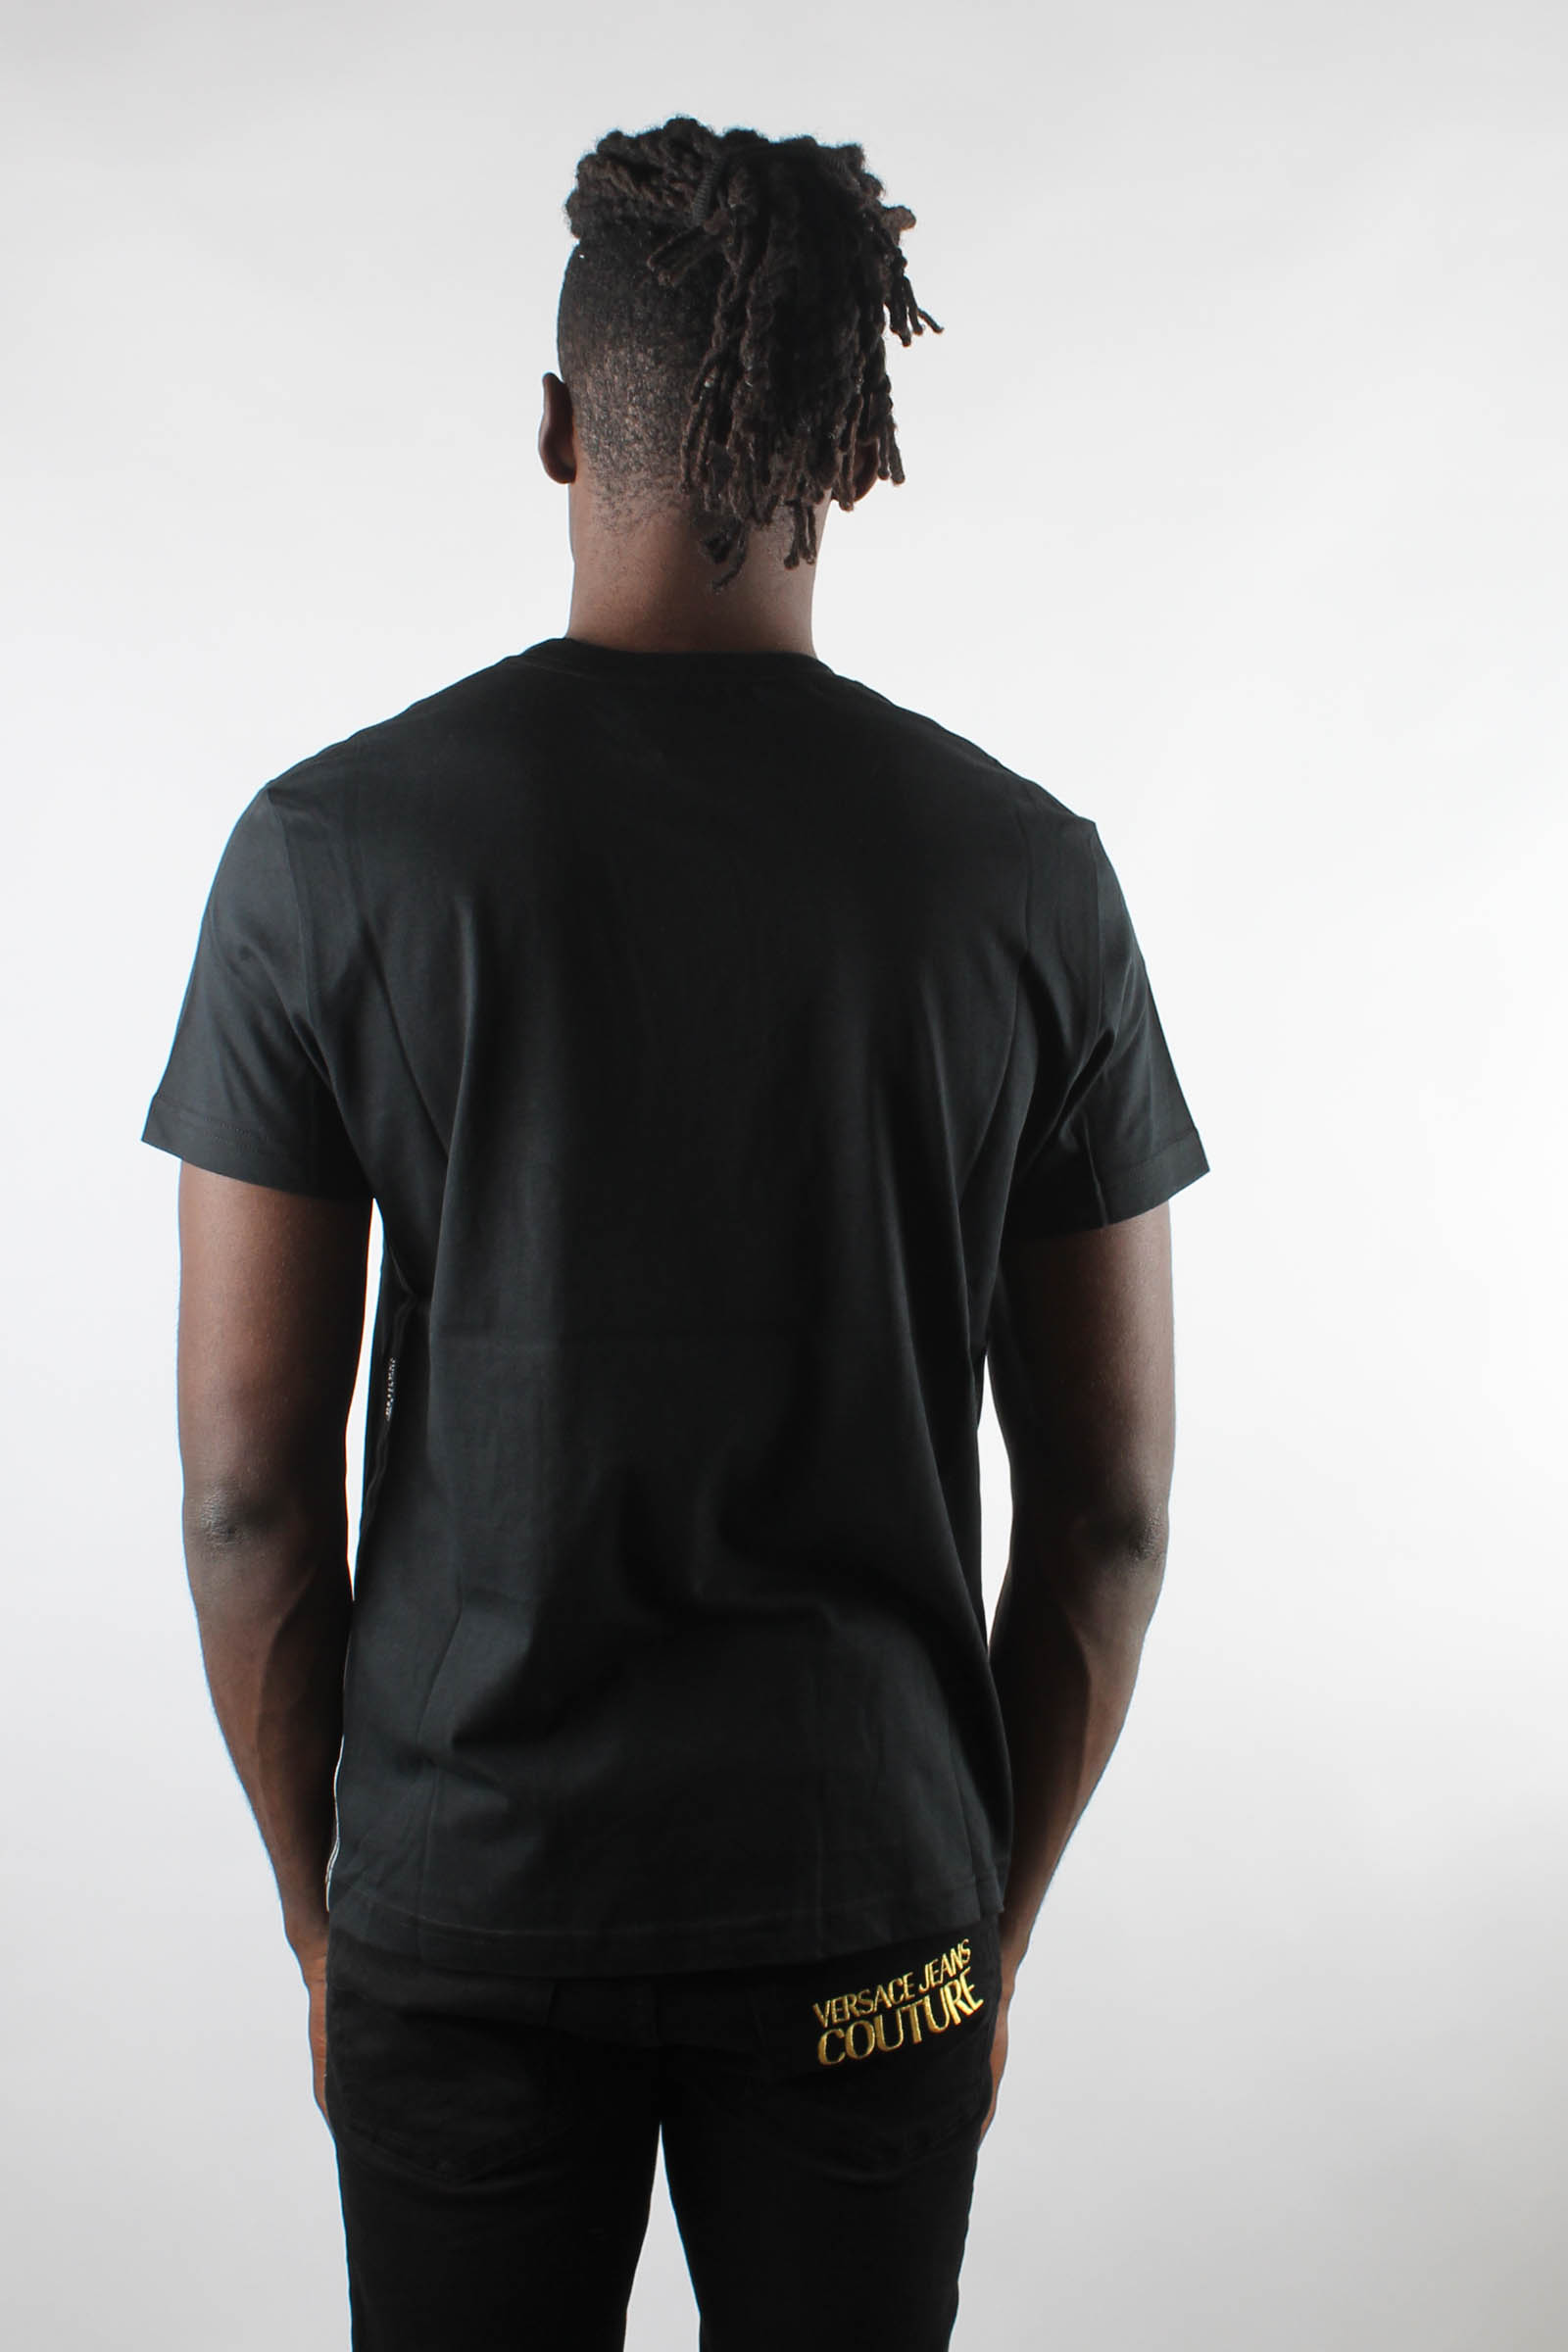 VERSACE JEANS   Shirt2   B3GZA7S2 11620899